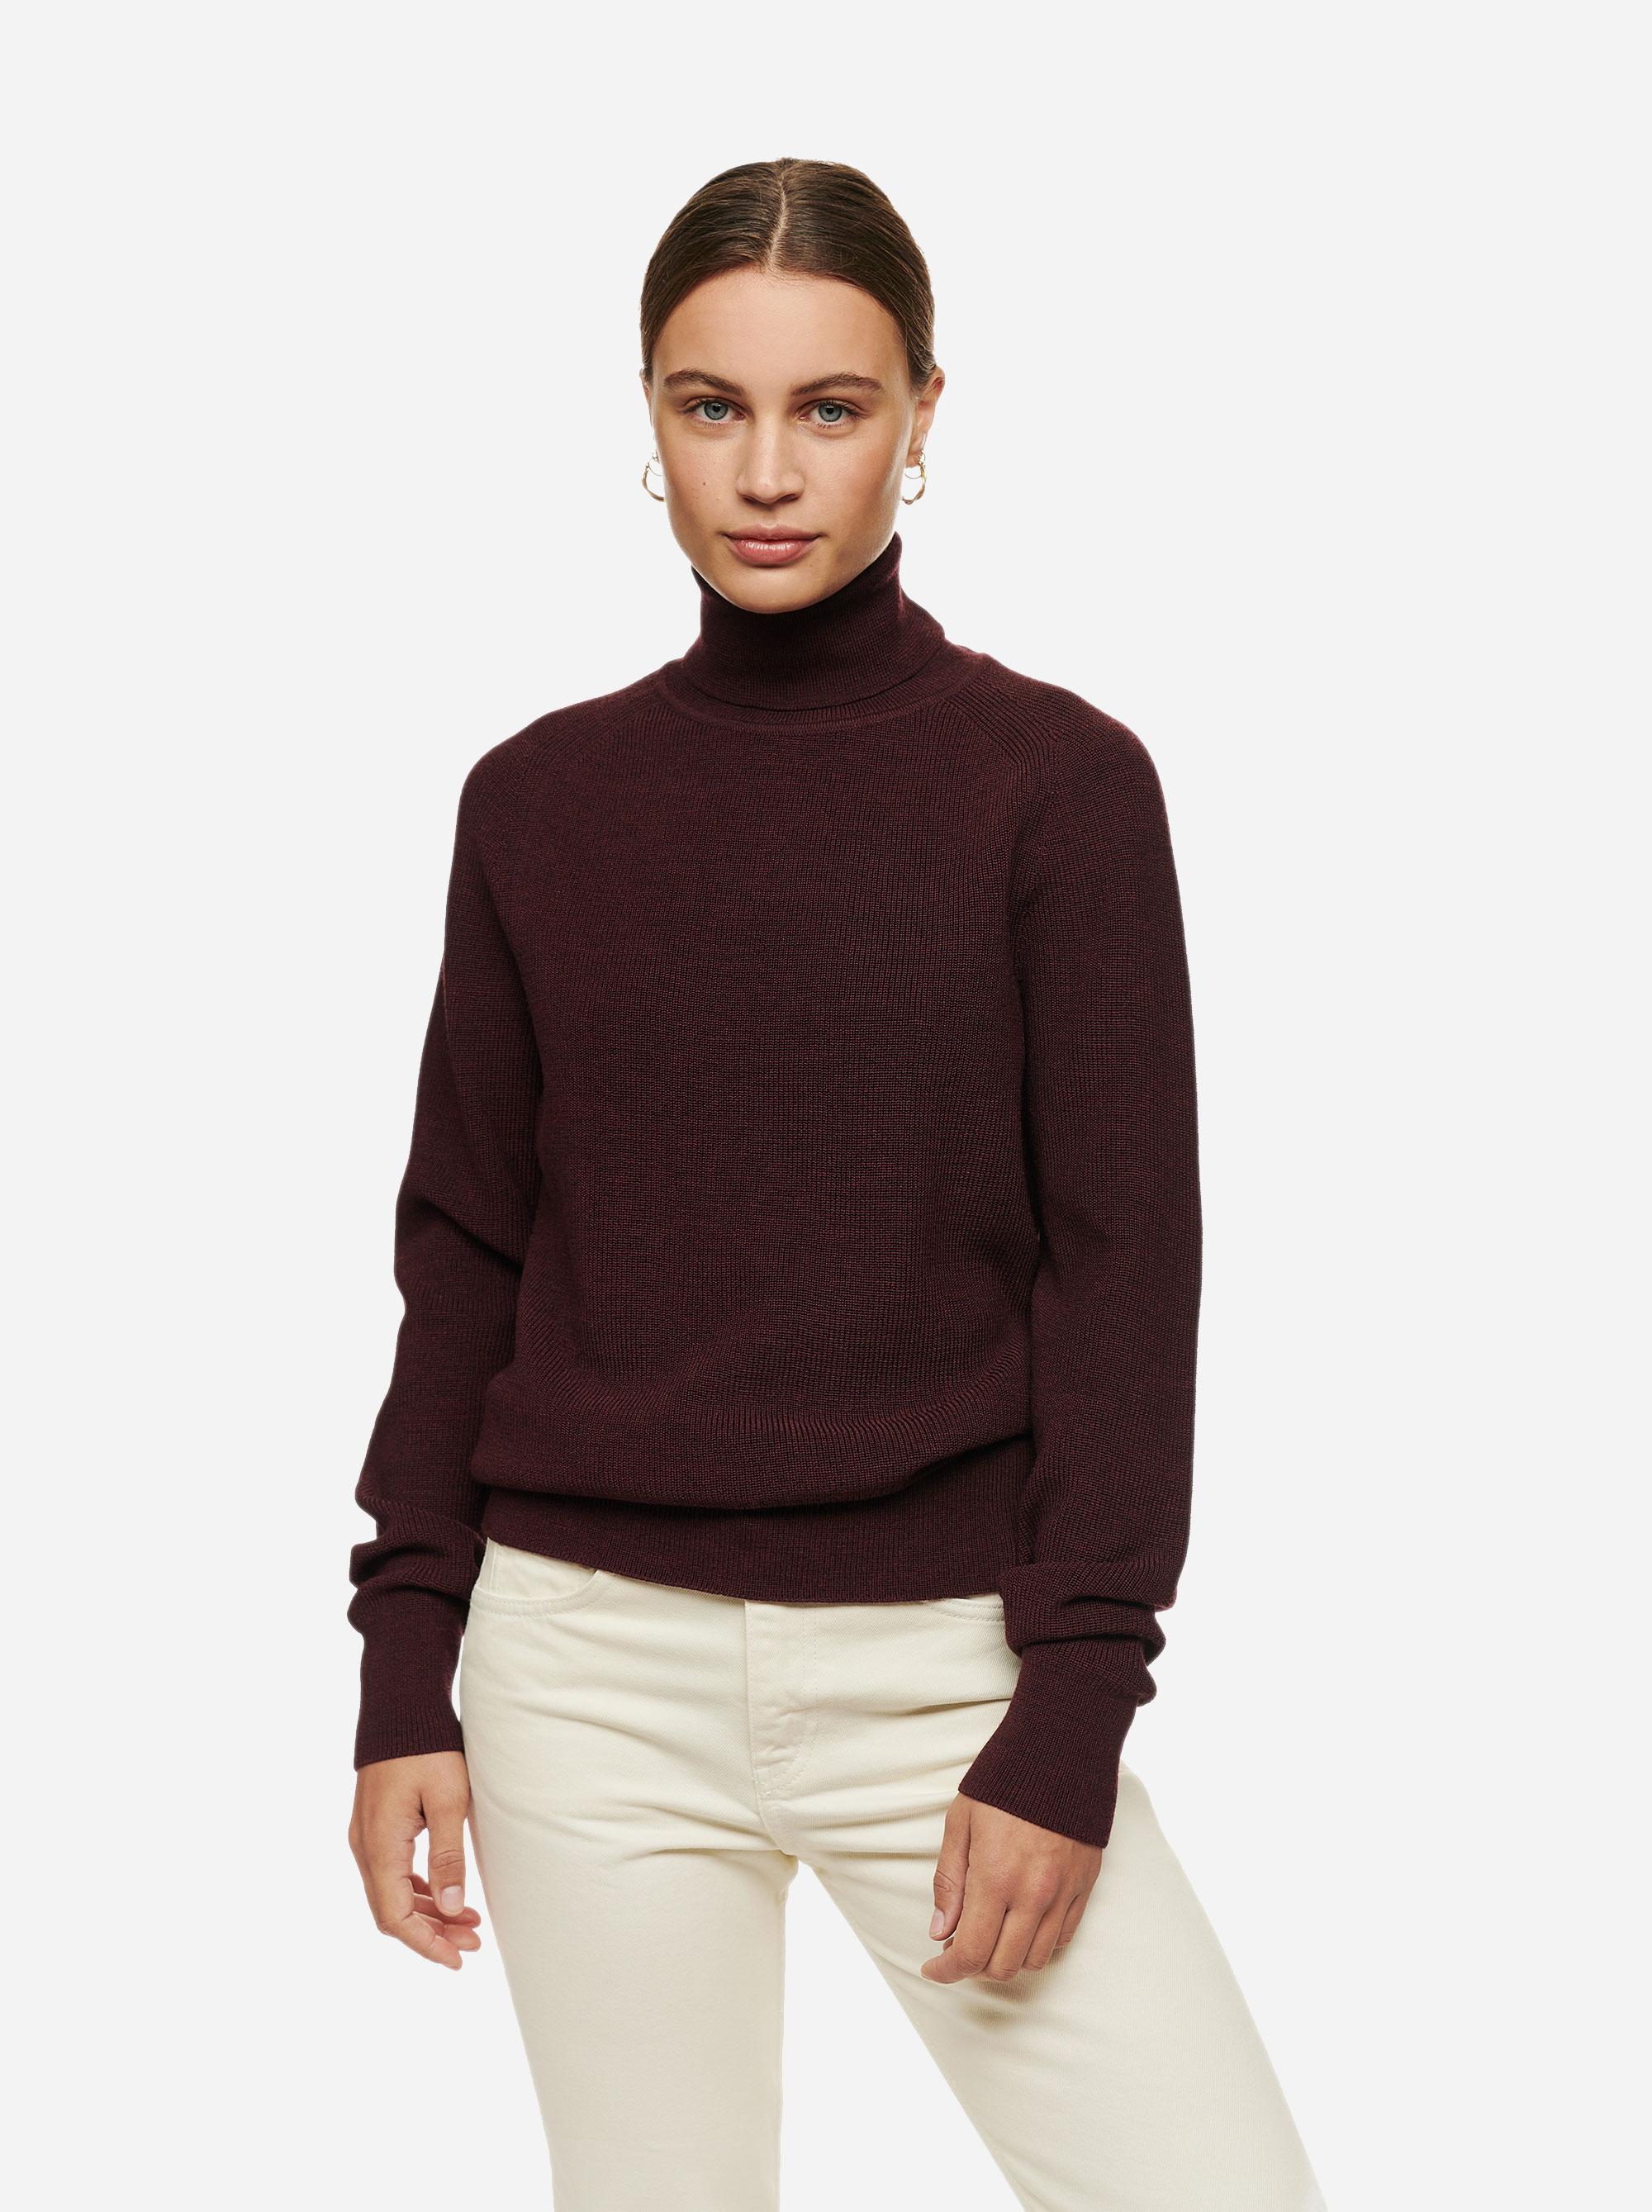 Teym - Turtleneck - The Merino Sweater - Men - Burgundy - 3